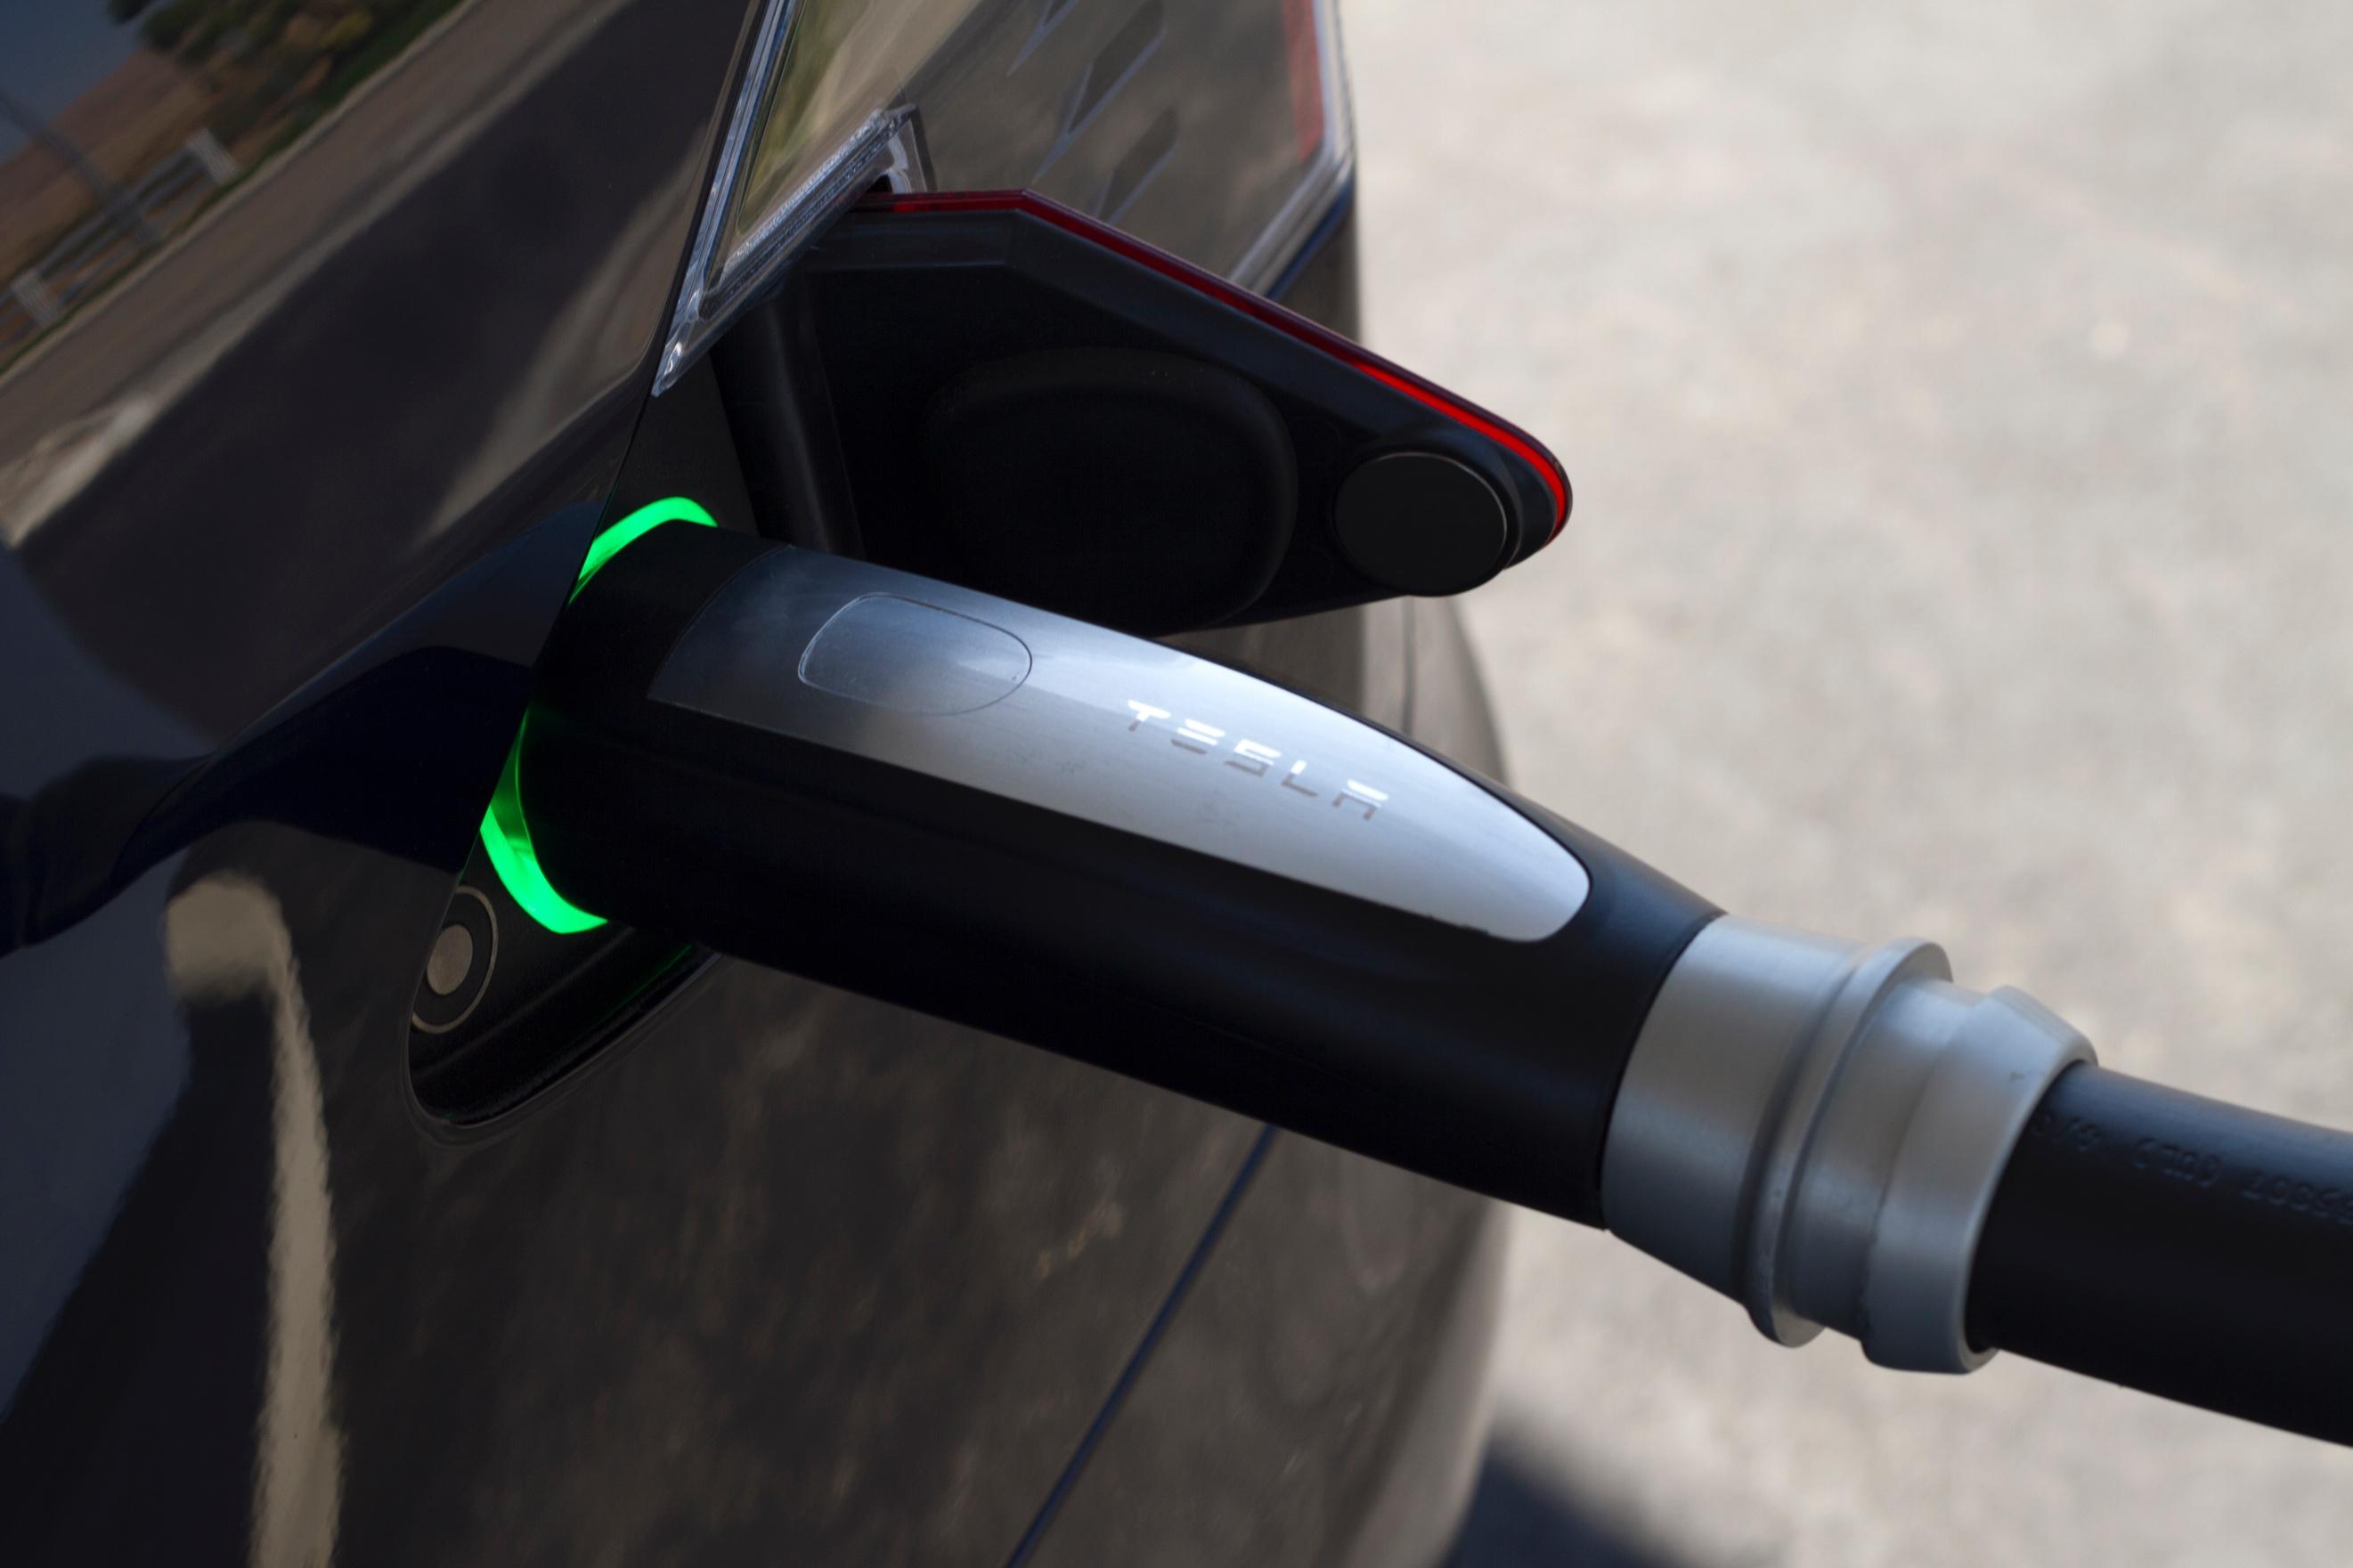 ../Press%20Kits/Tesla_ChargingAndSuperchargeNetwork/IMG_0044.jpg